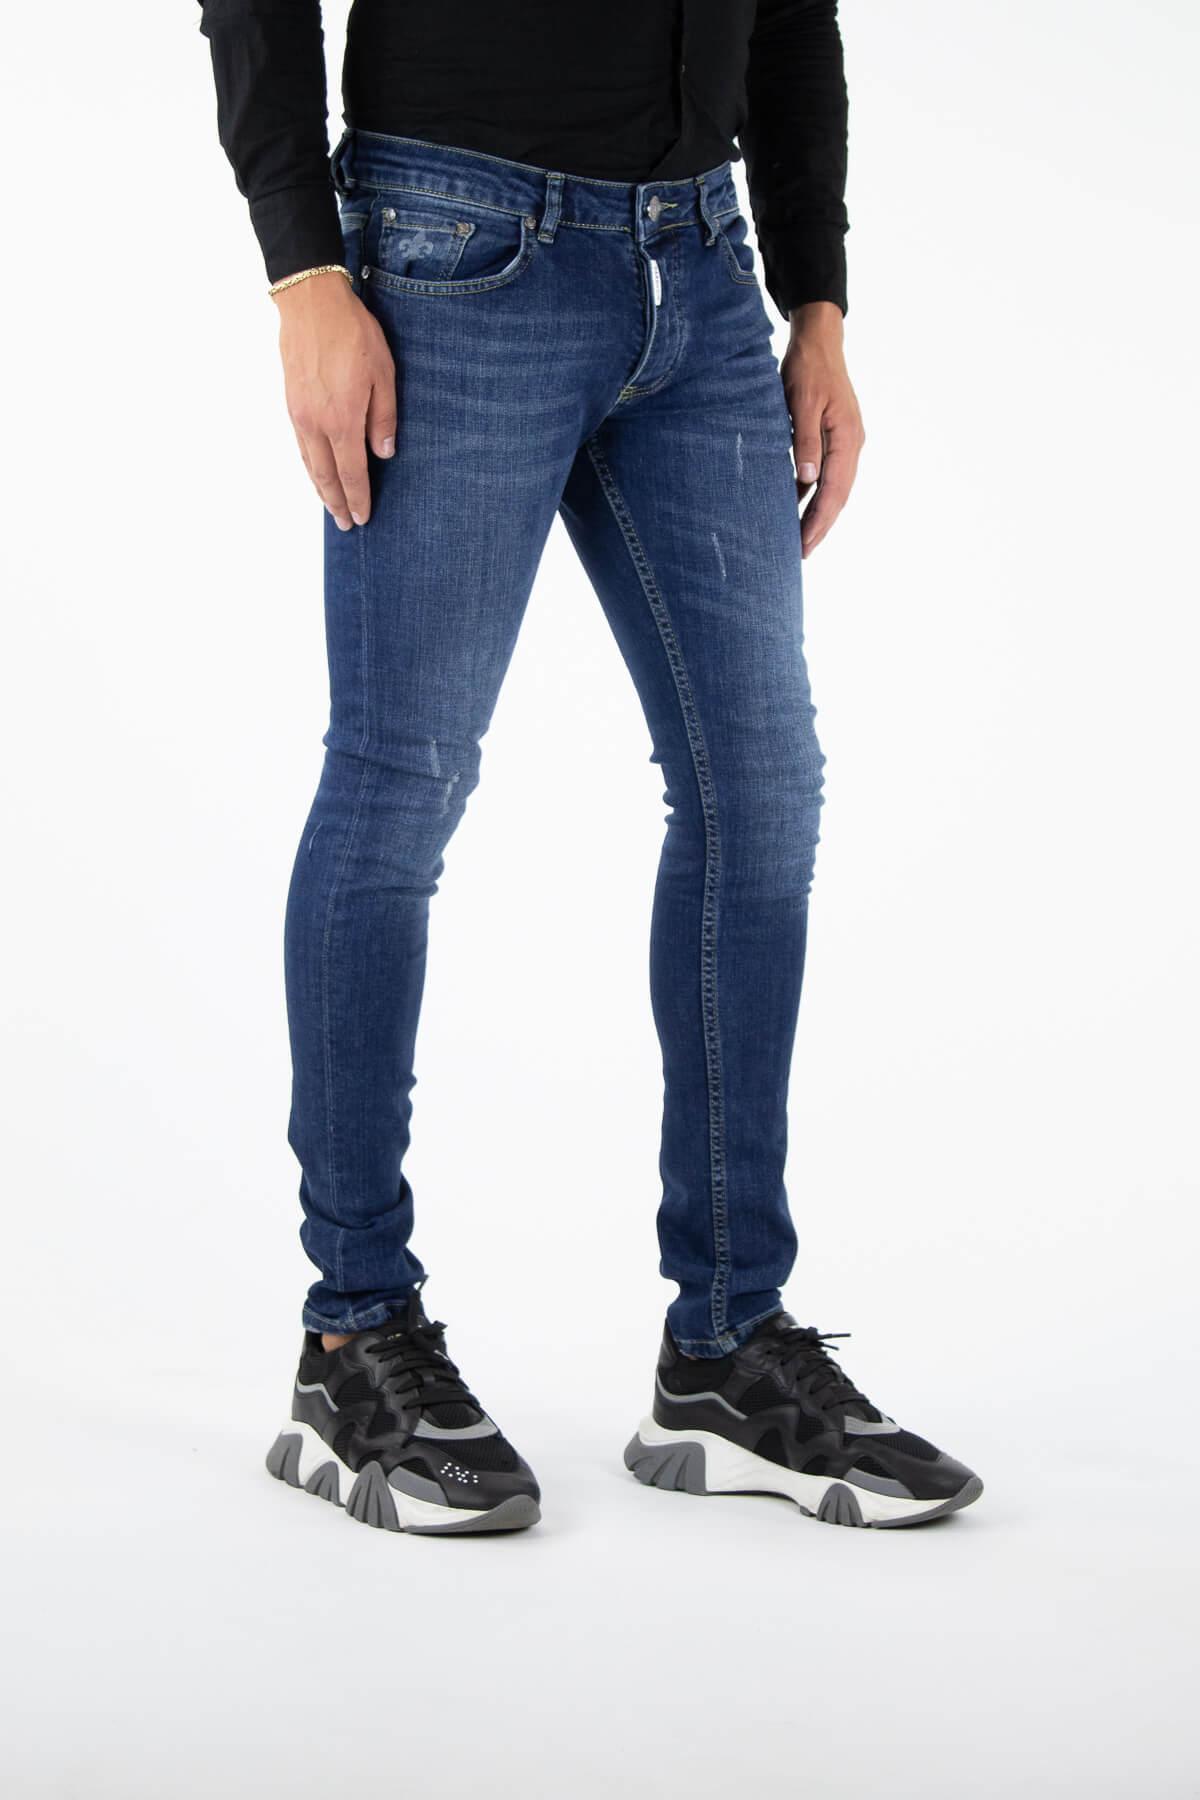 Morlaix Deluxe Blue Jeans-2